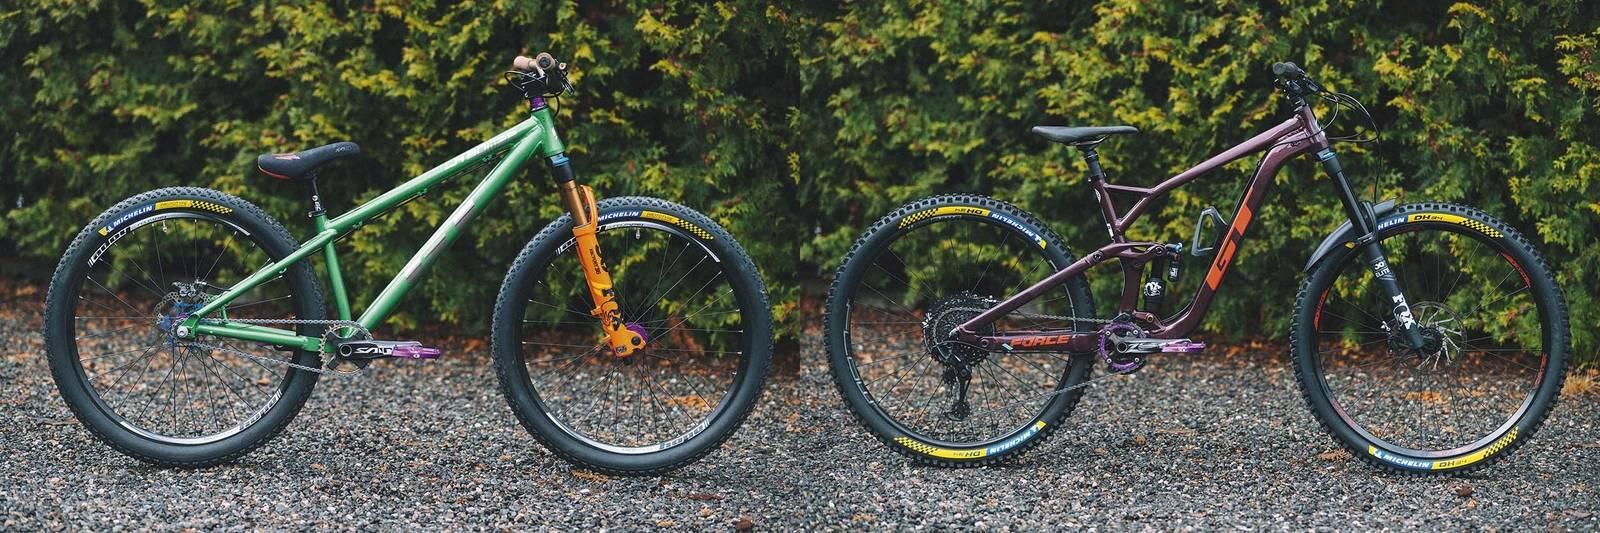 sykler-brage-vestavik-E5I6022